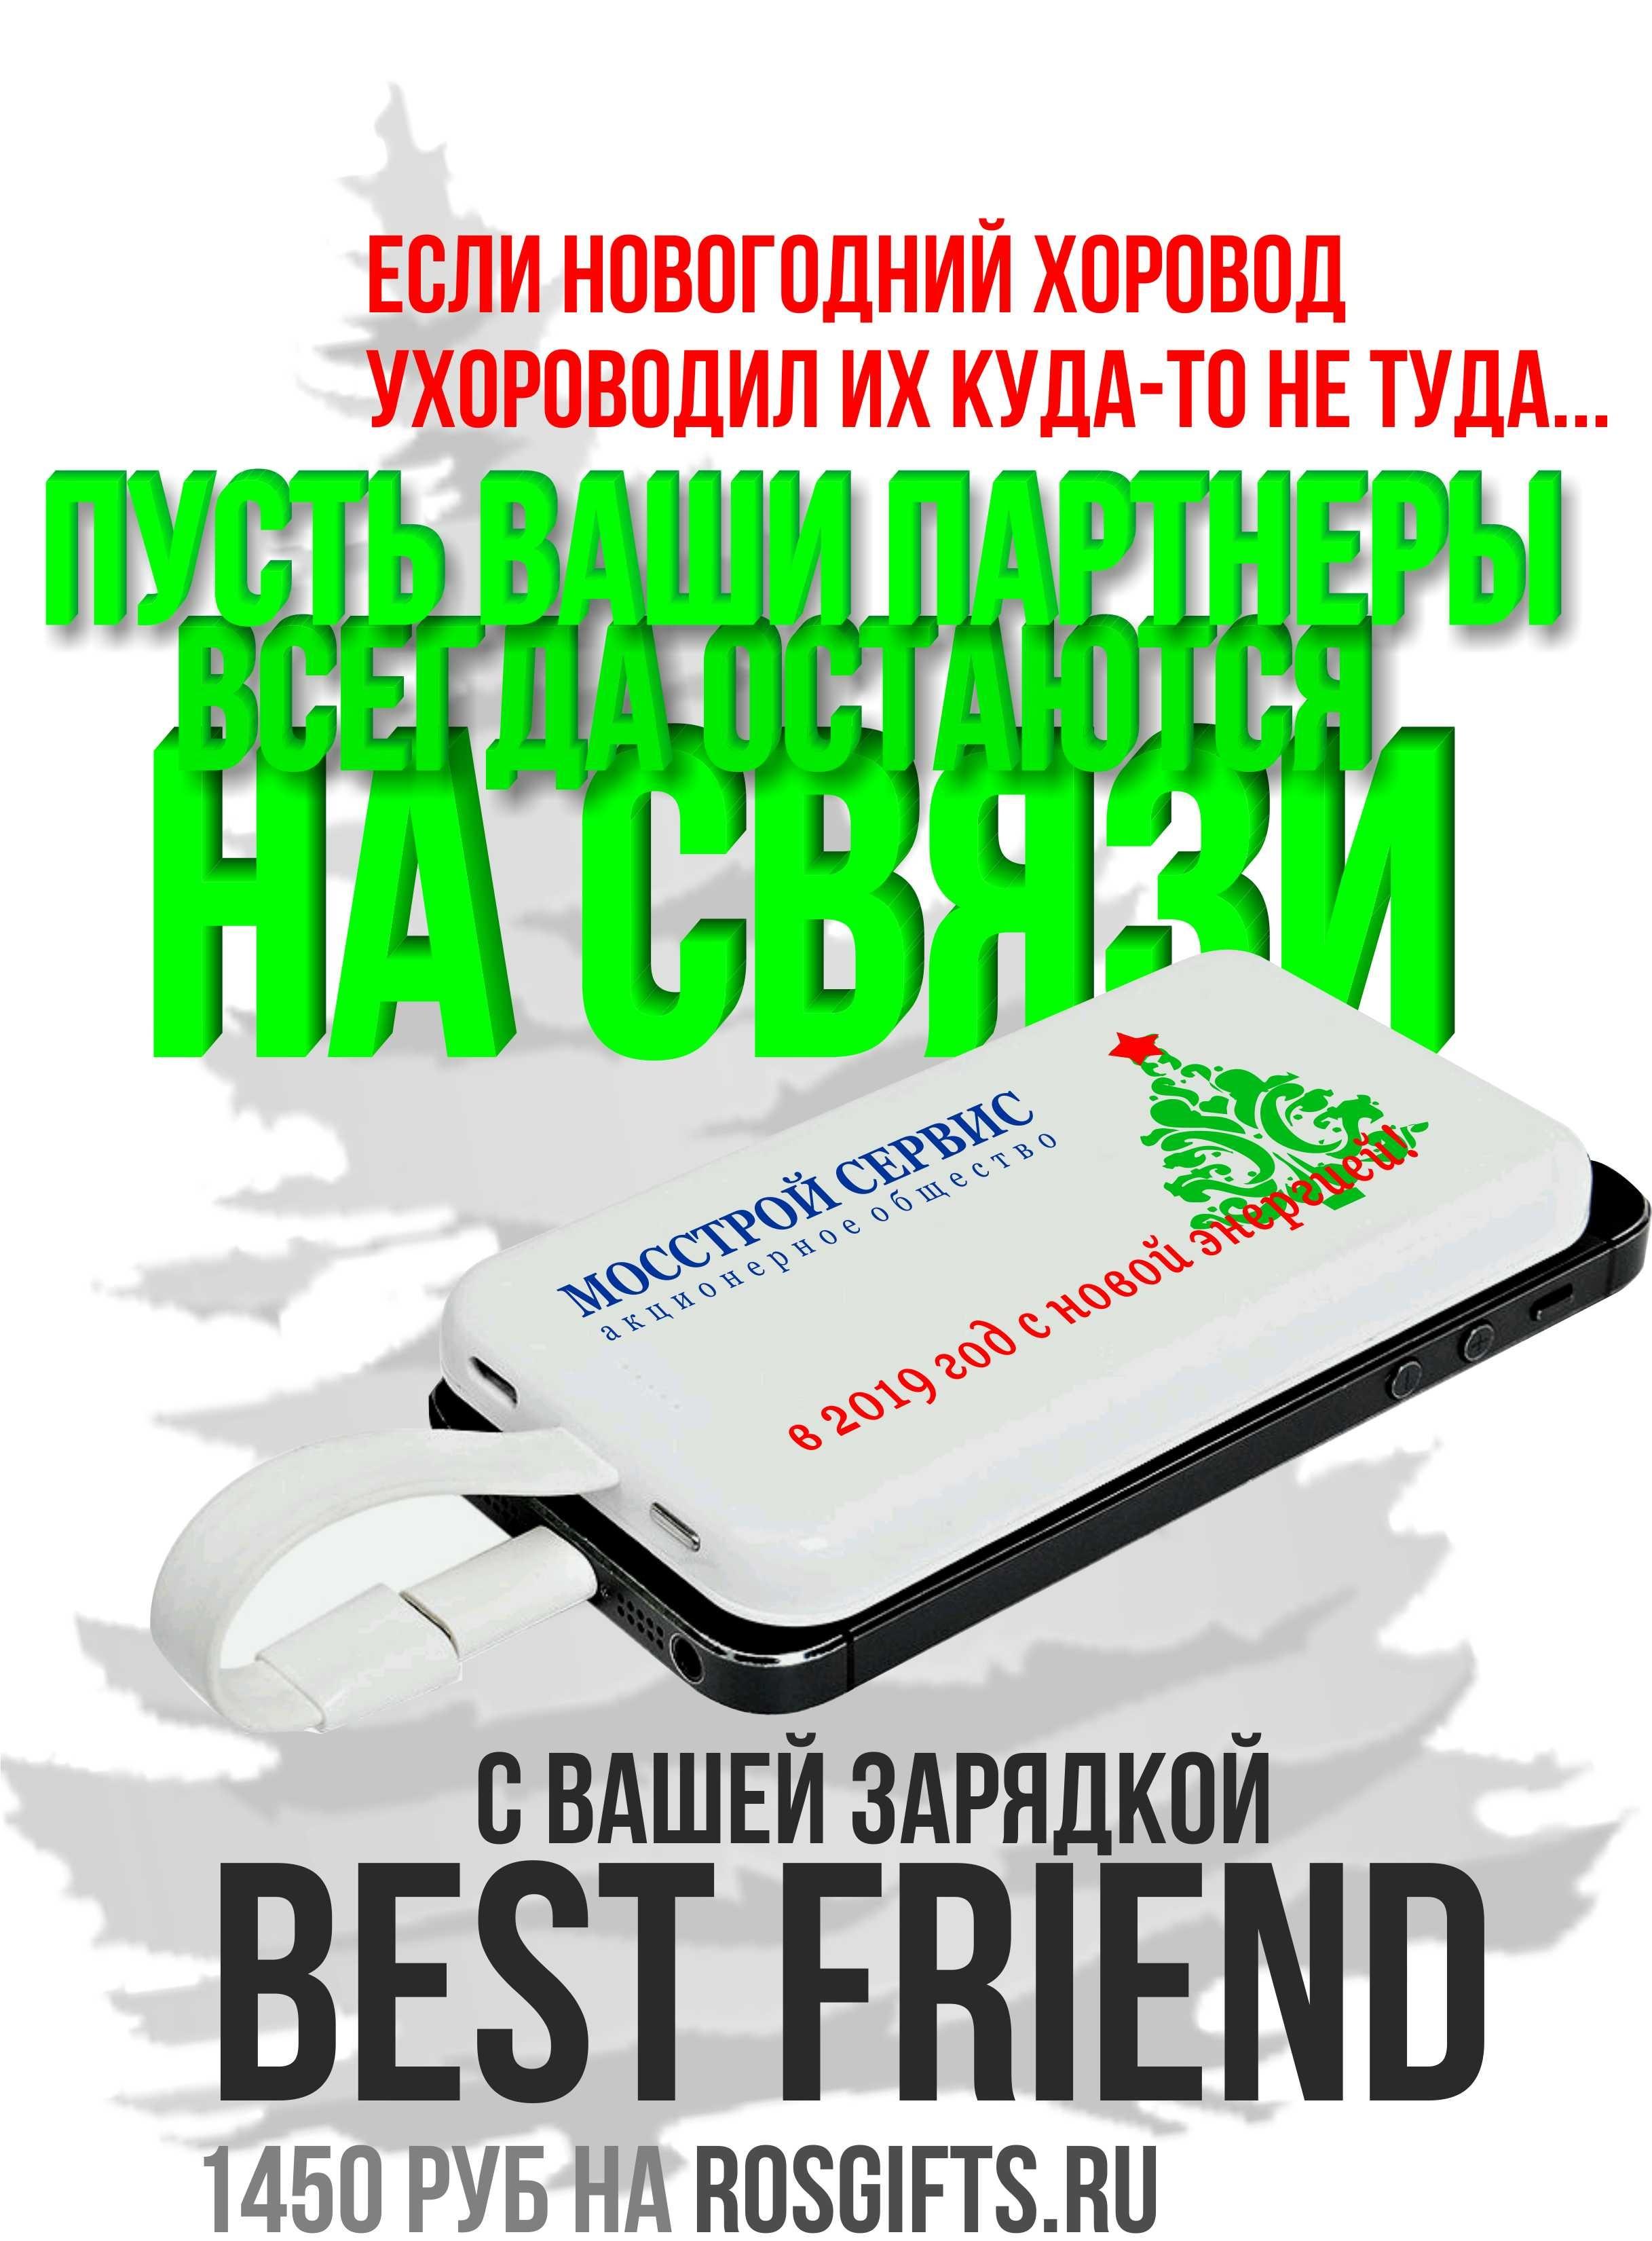 внешние аккумуляторы оптом   Best friend - 23000 rosgifts